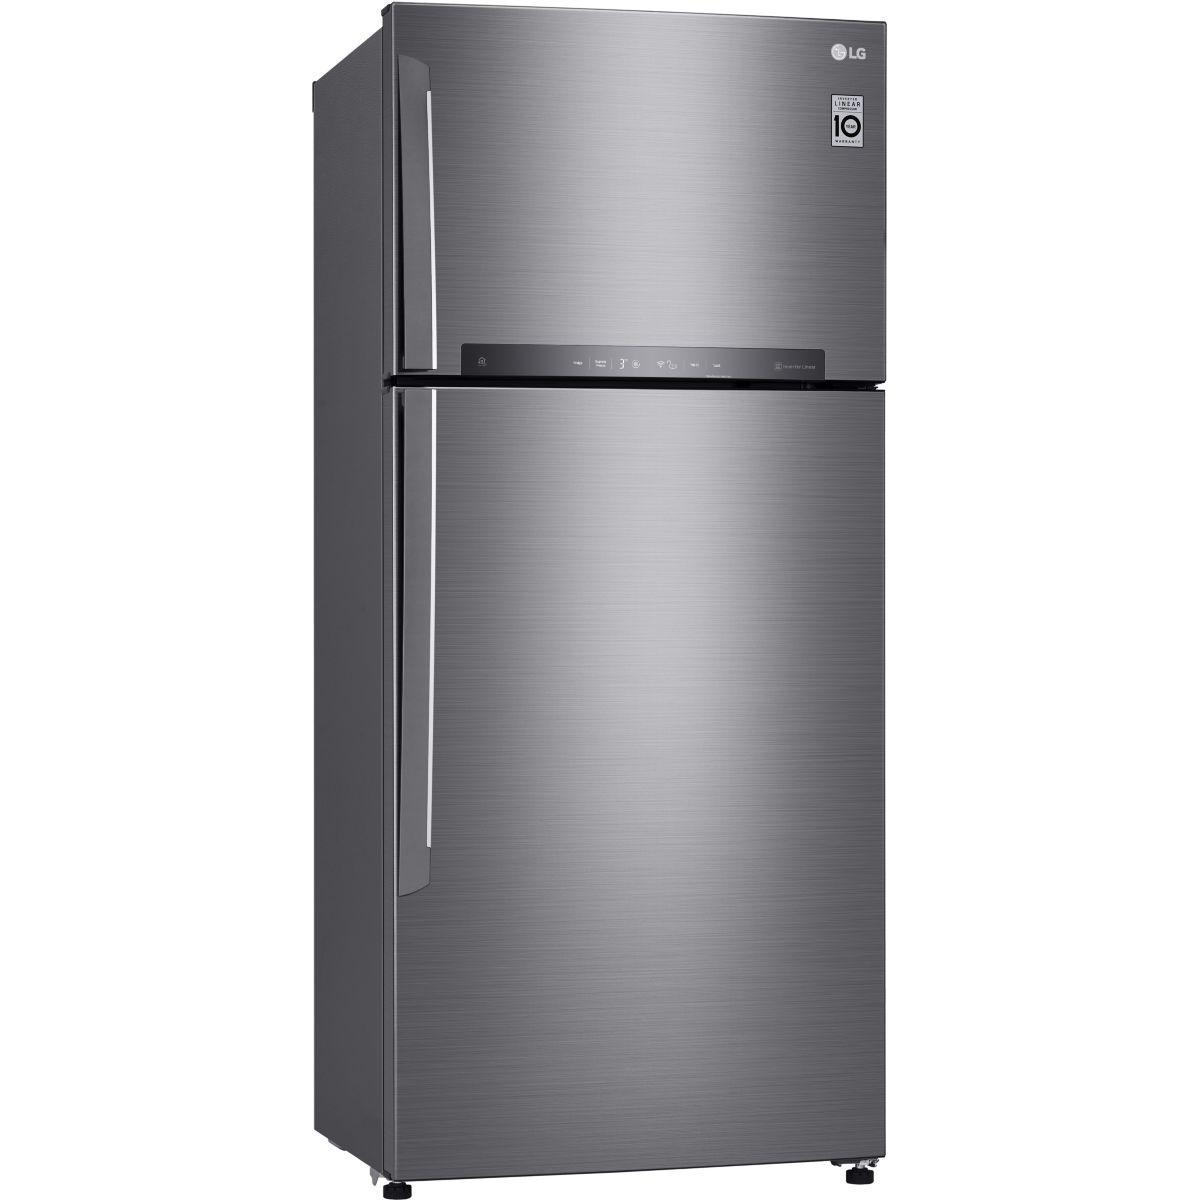 Lg en promos soldes 75 discount total for Refrigerateur air brasse ou ventile